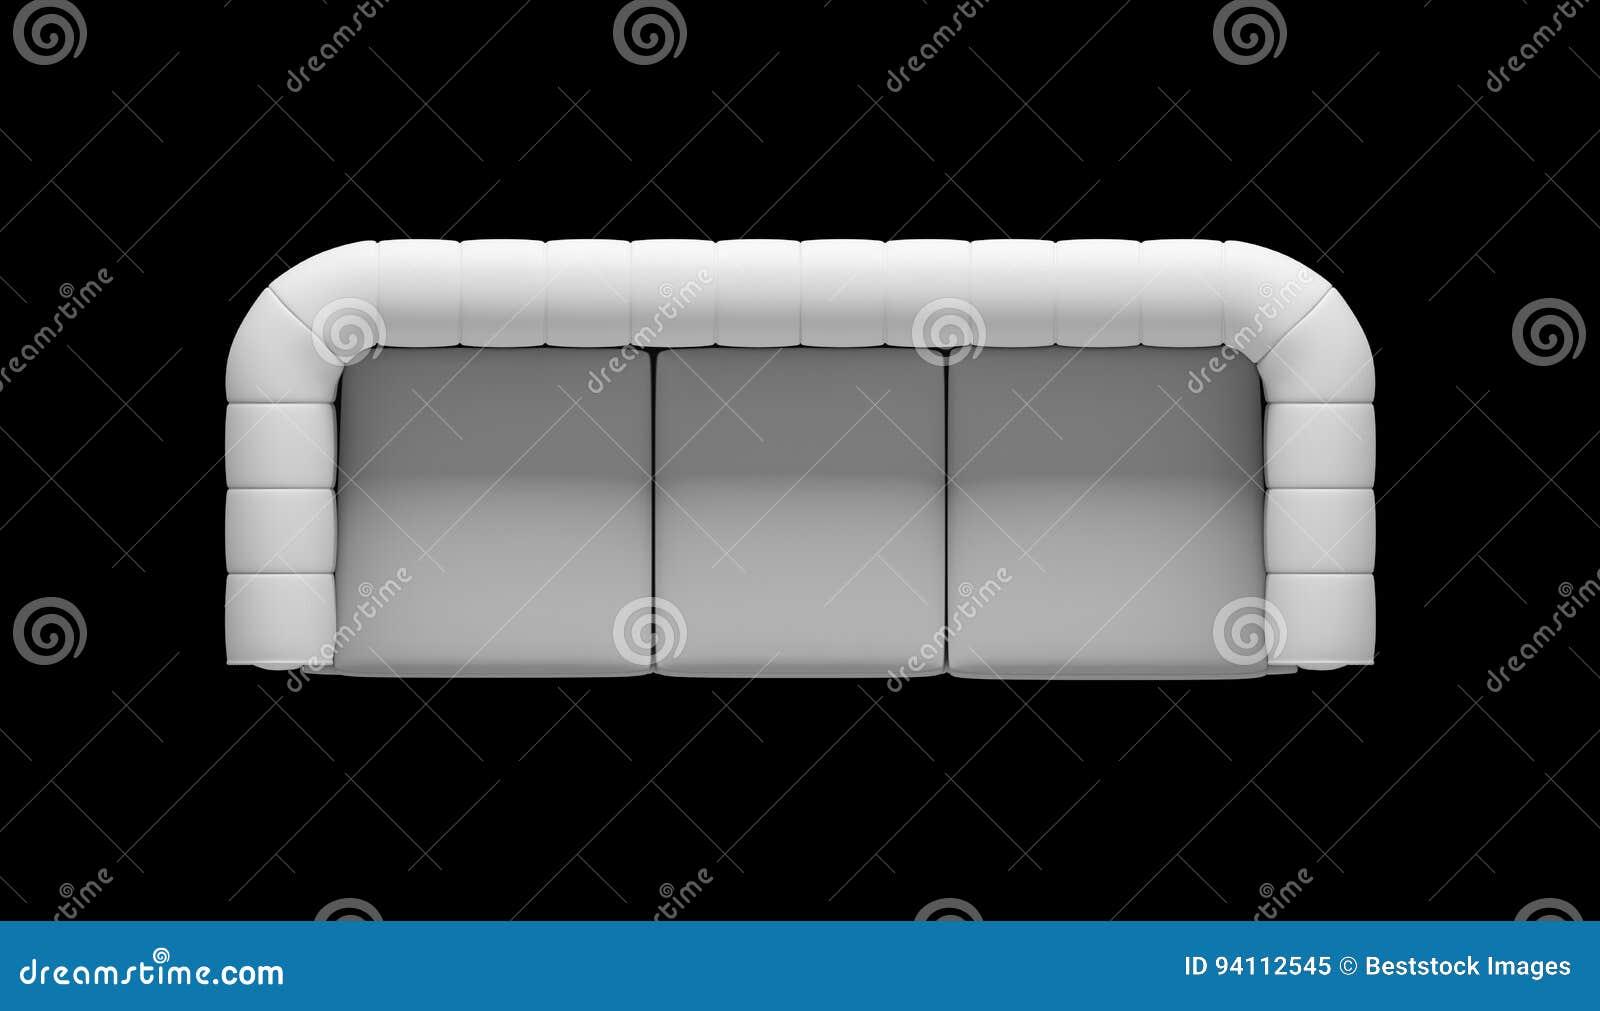 Remarkable Three Seat Sofa Top View Illustration Stock Illustration Machost Co Dining Chair Design Ideas Machostcouk